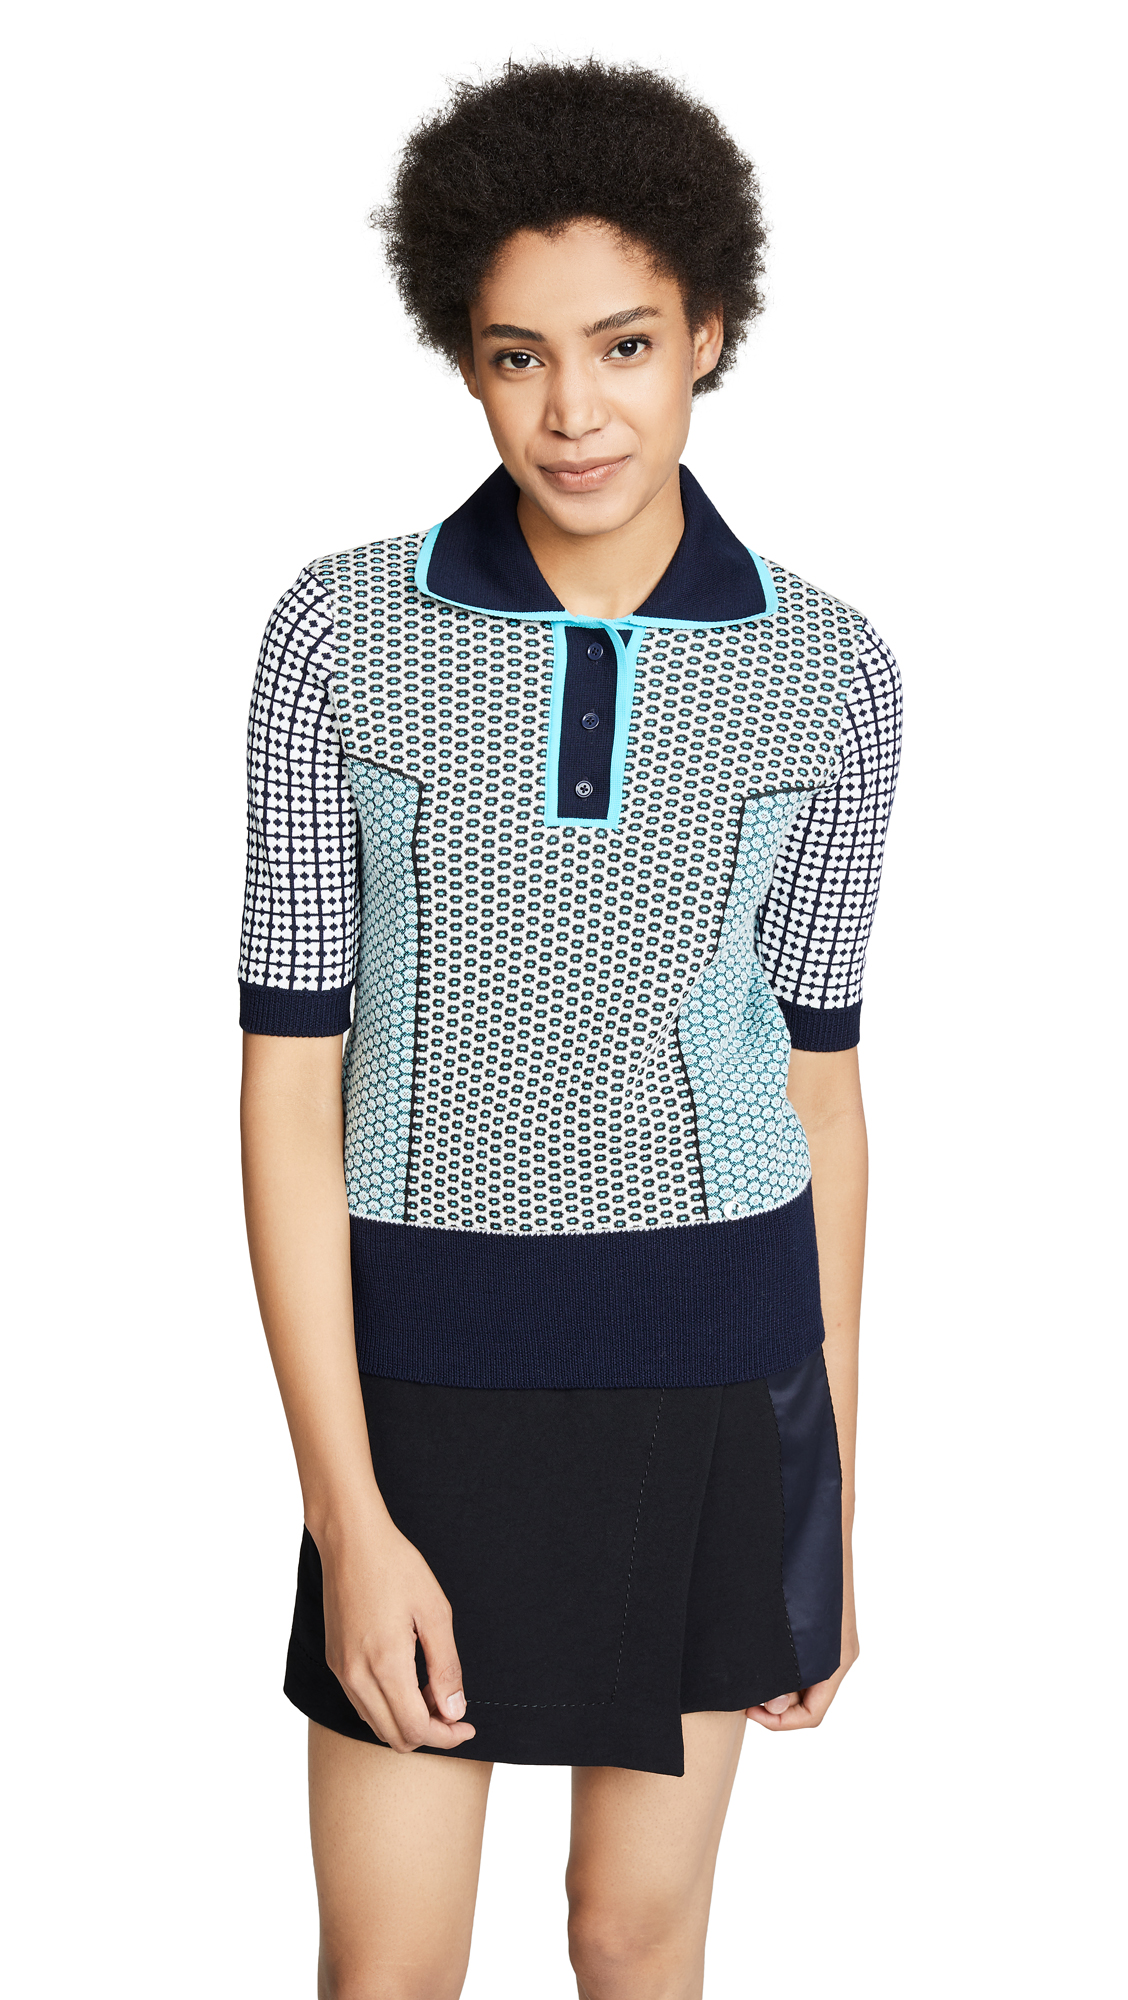 Carven Polo Shirt In Dark Blue